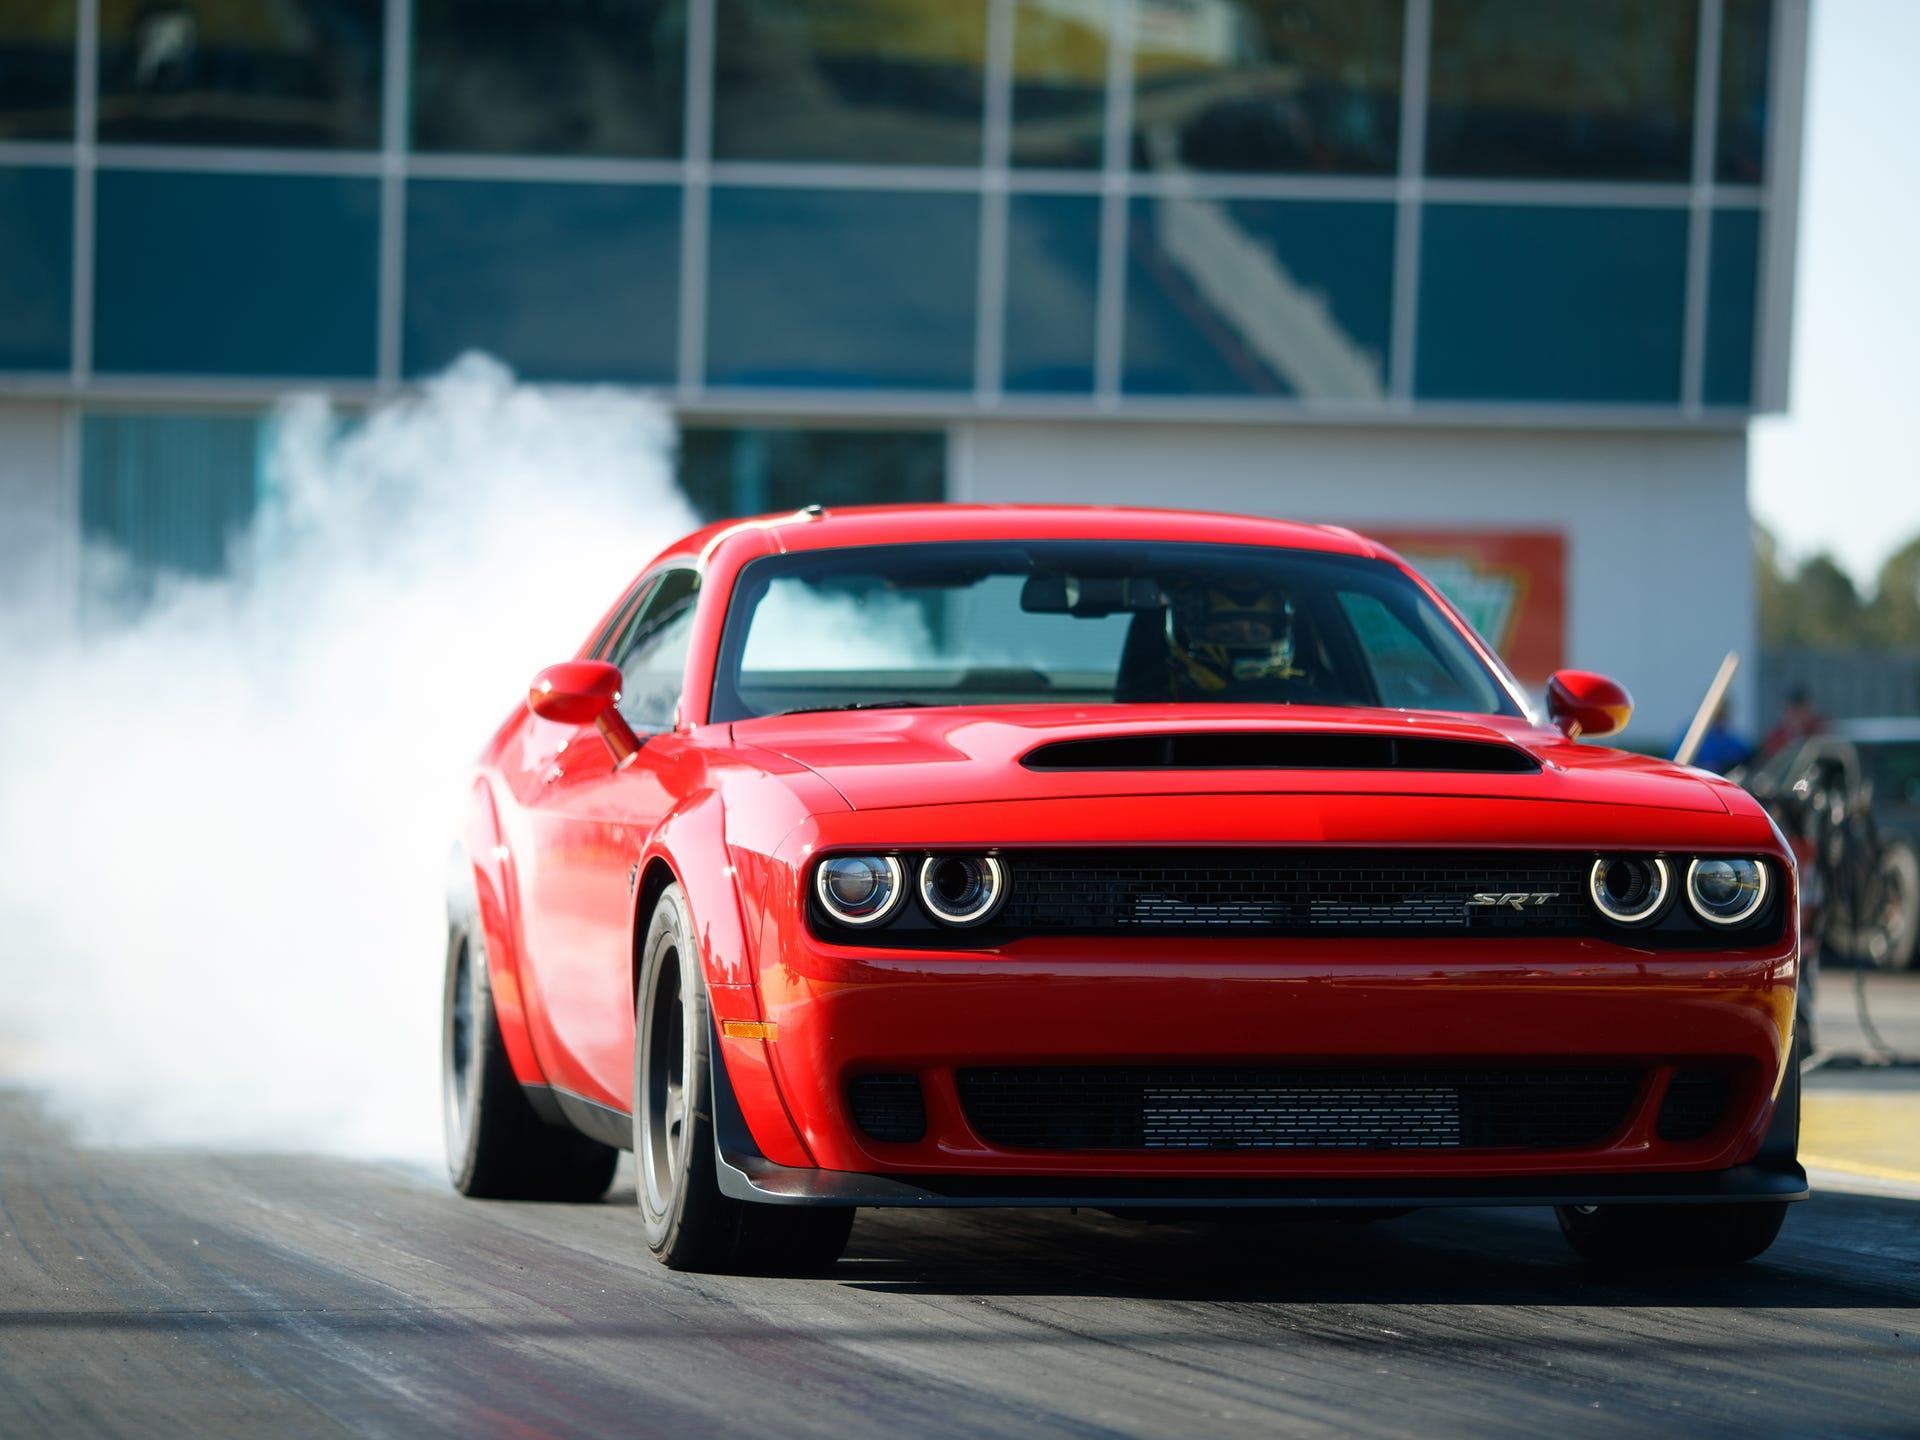 The 2018 Dodge Challenger Srt Demon